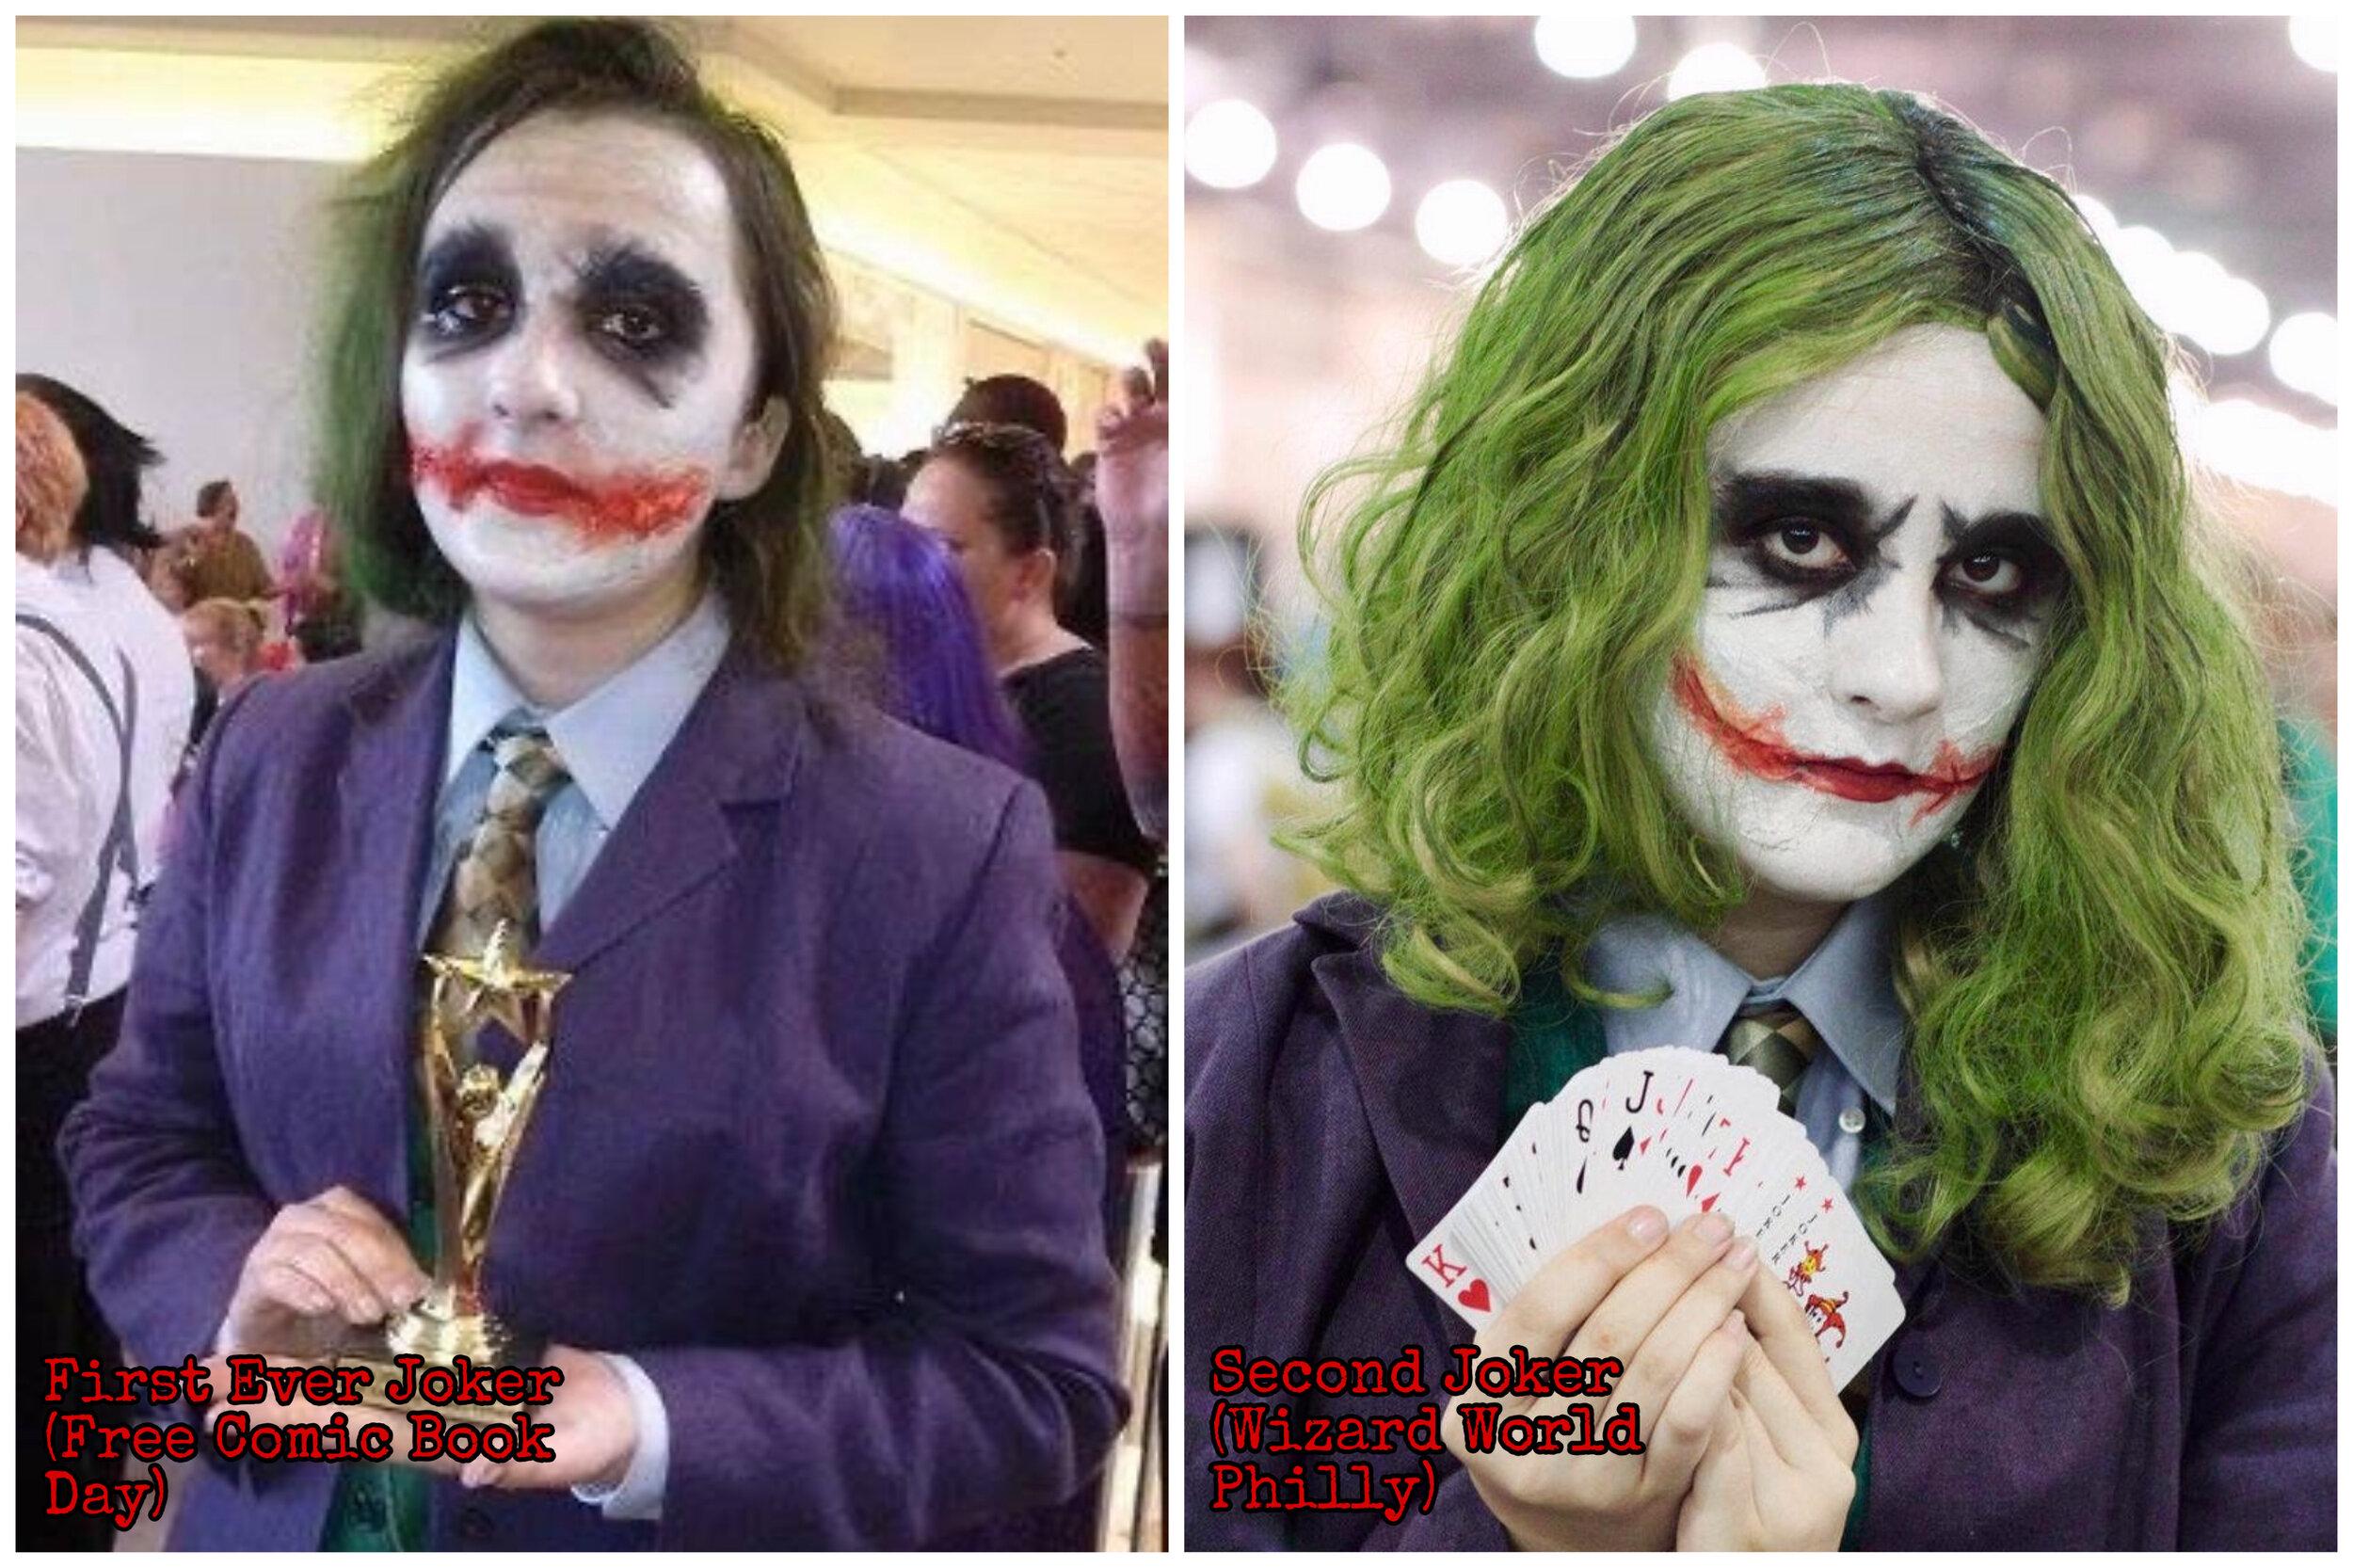 Joker cosplay comparrisons